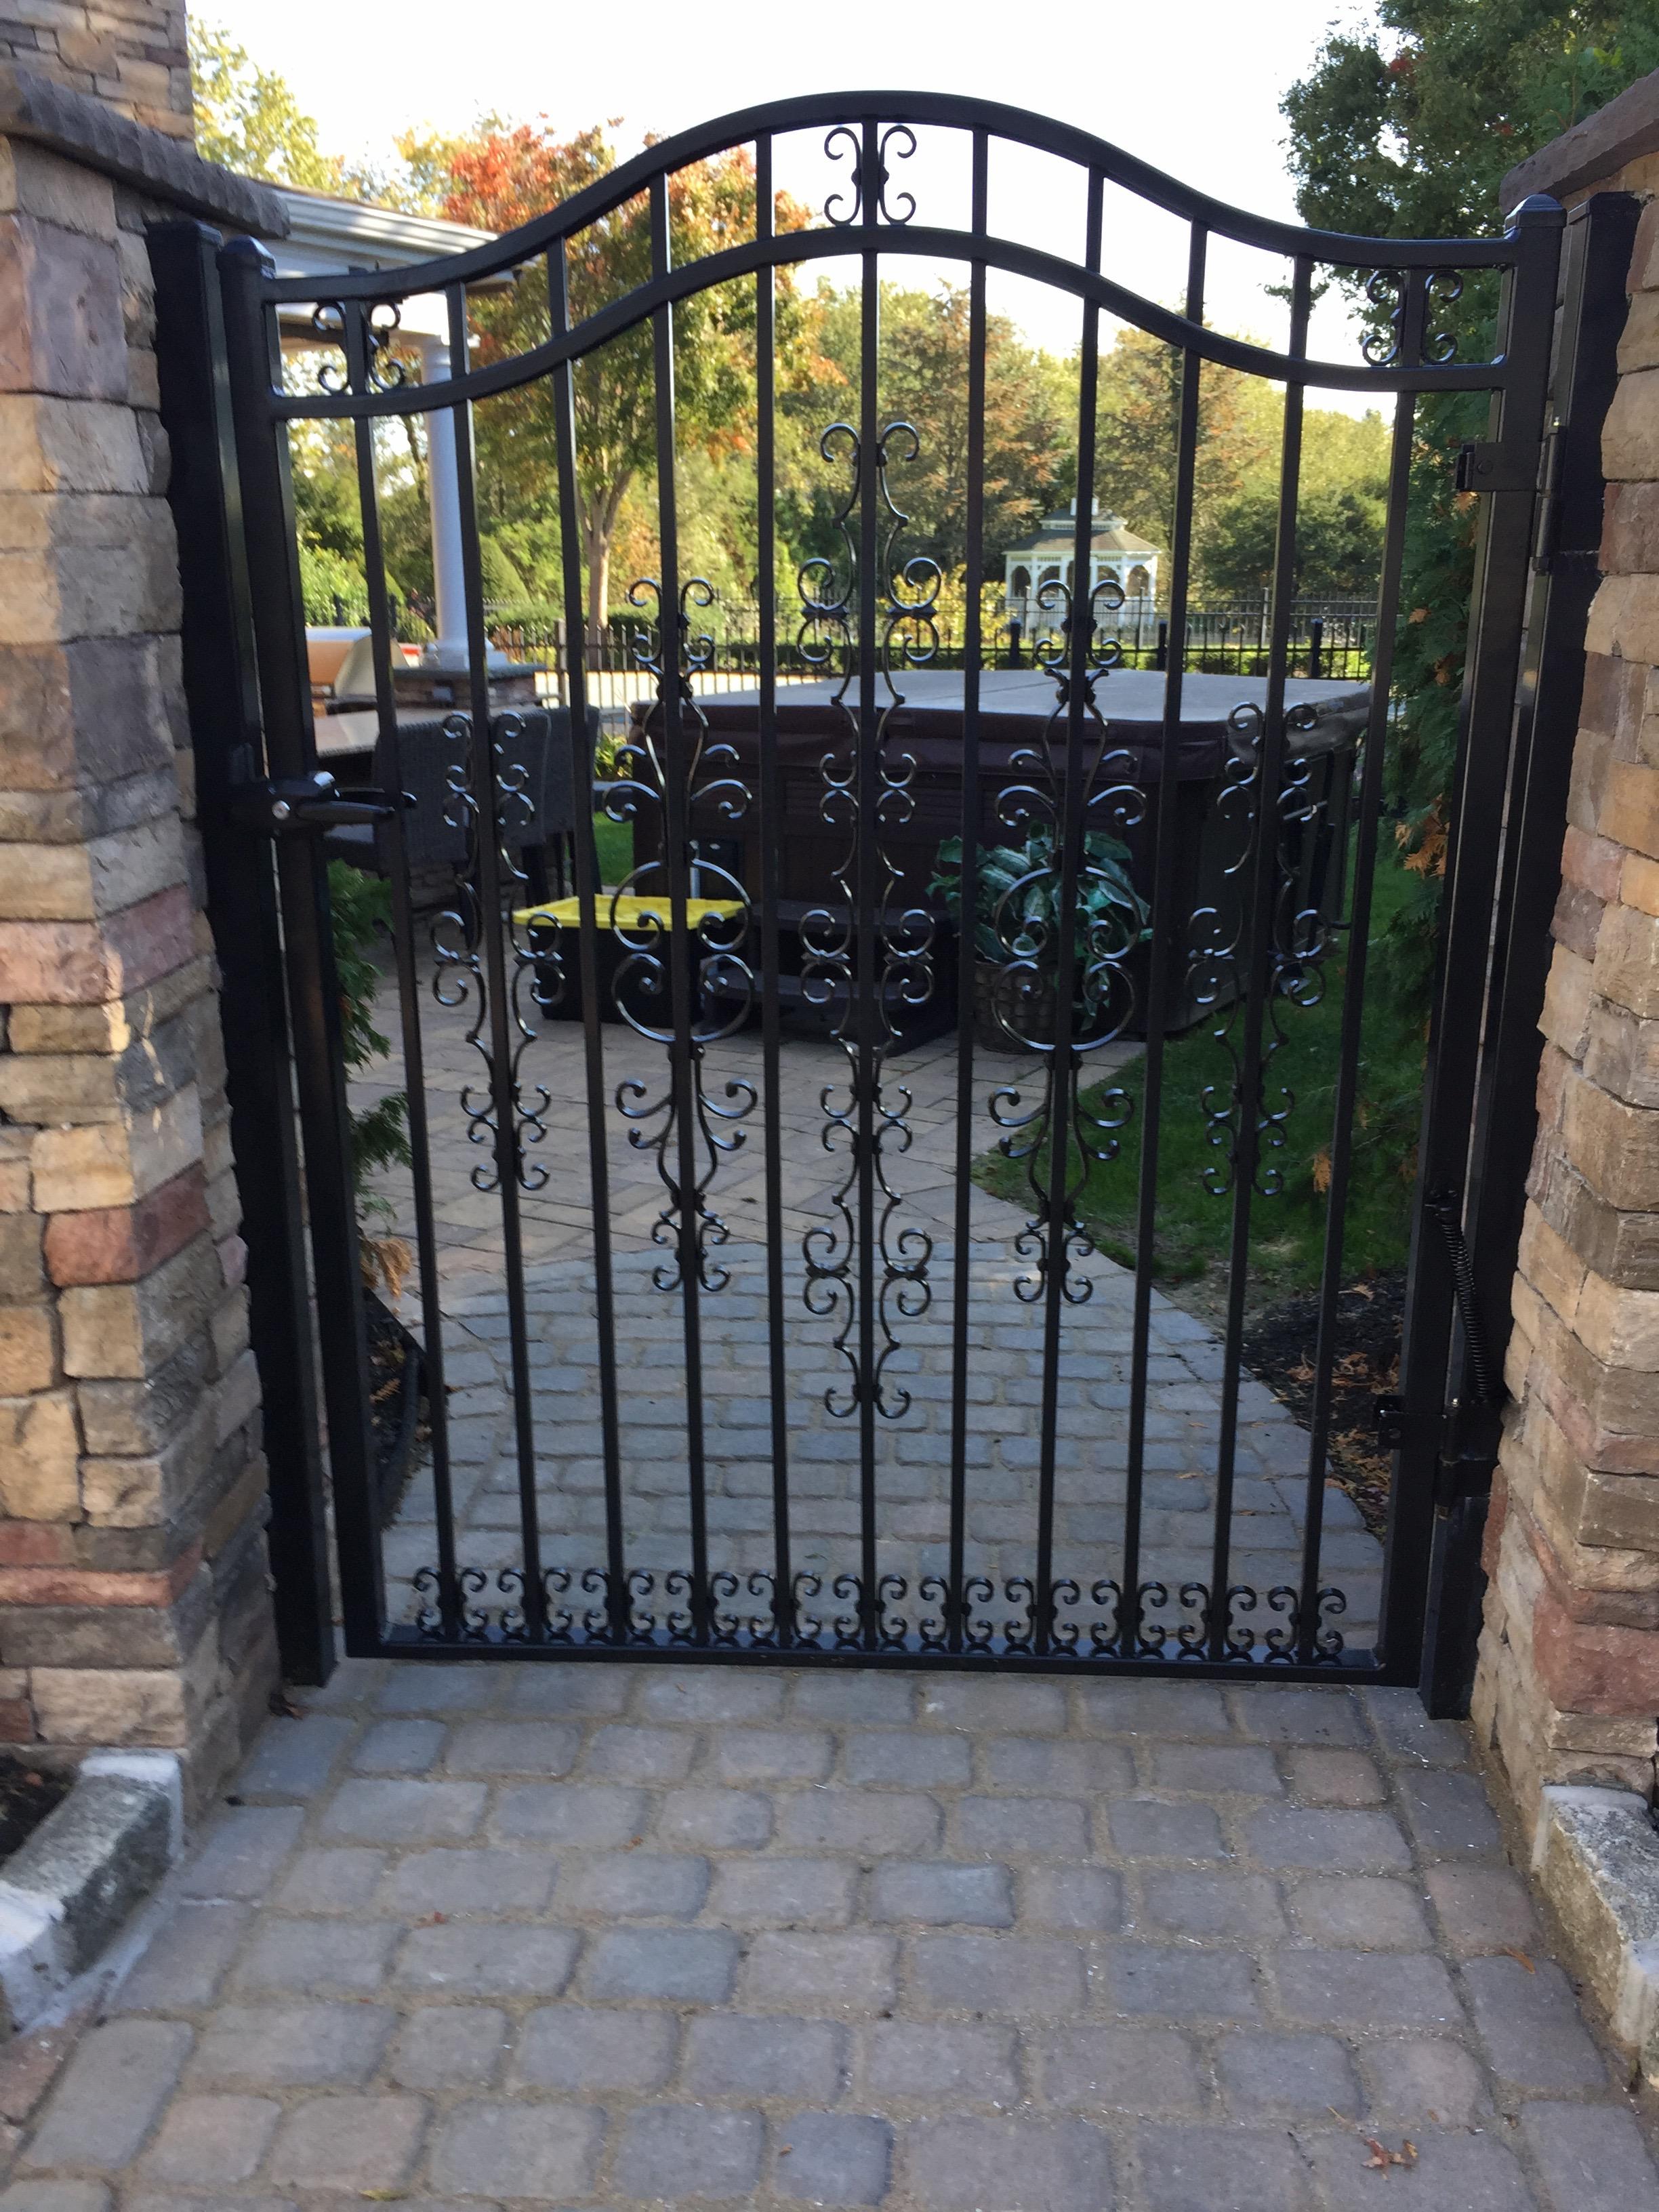 Top aluminum gate landscape design company in Long Island, NY